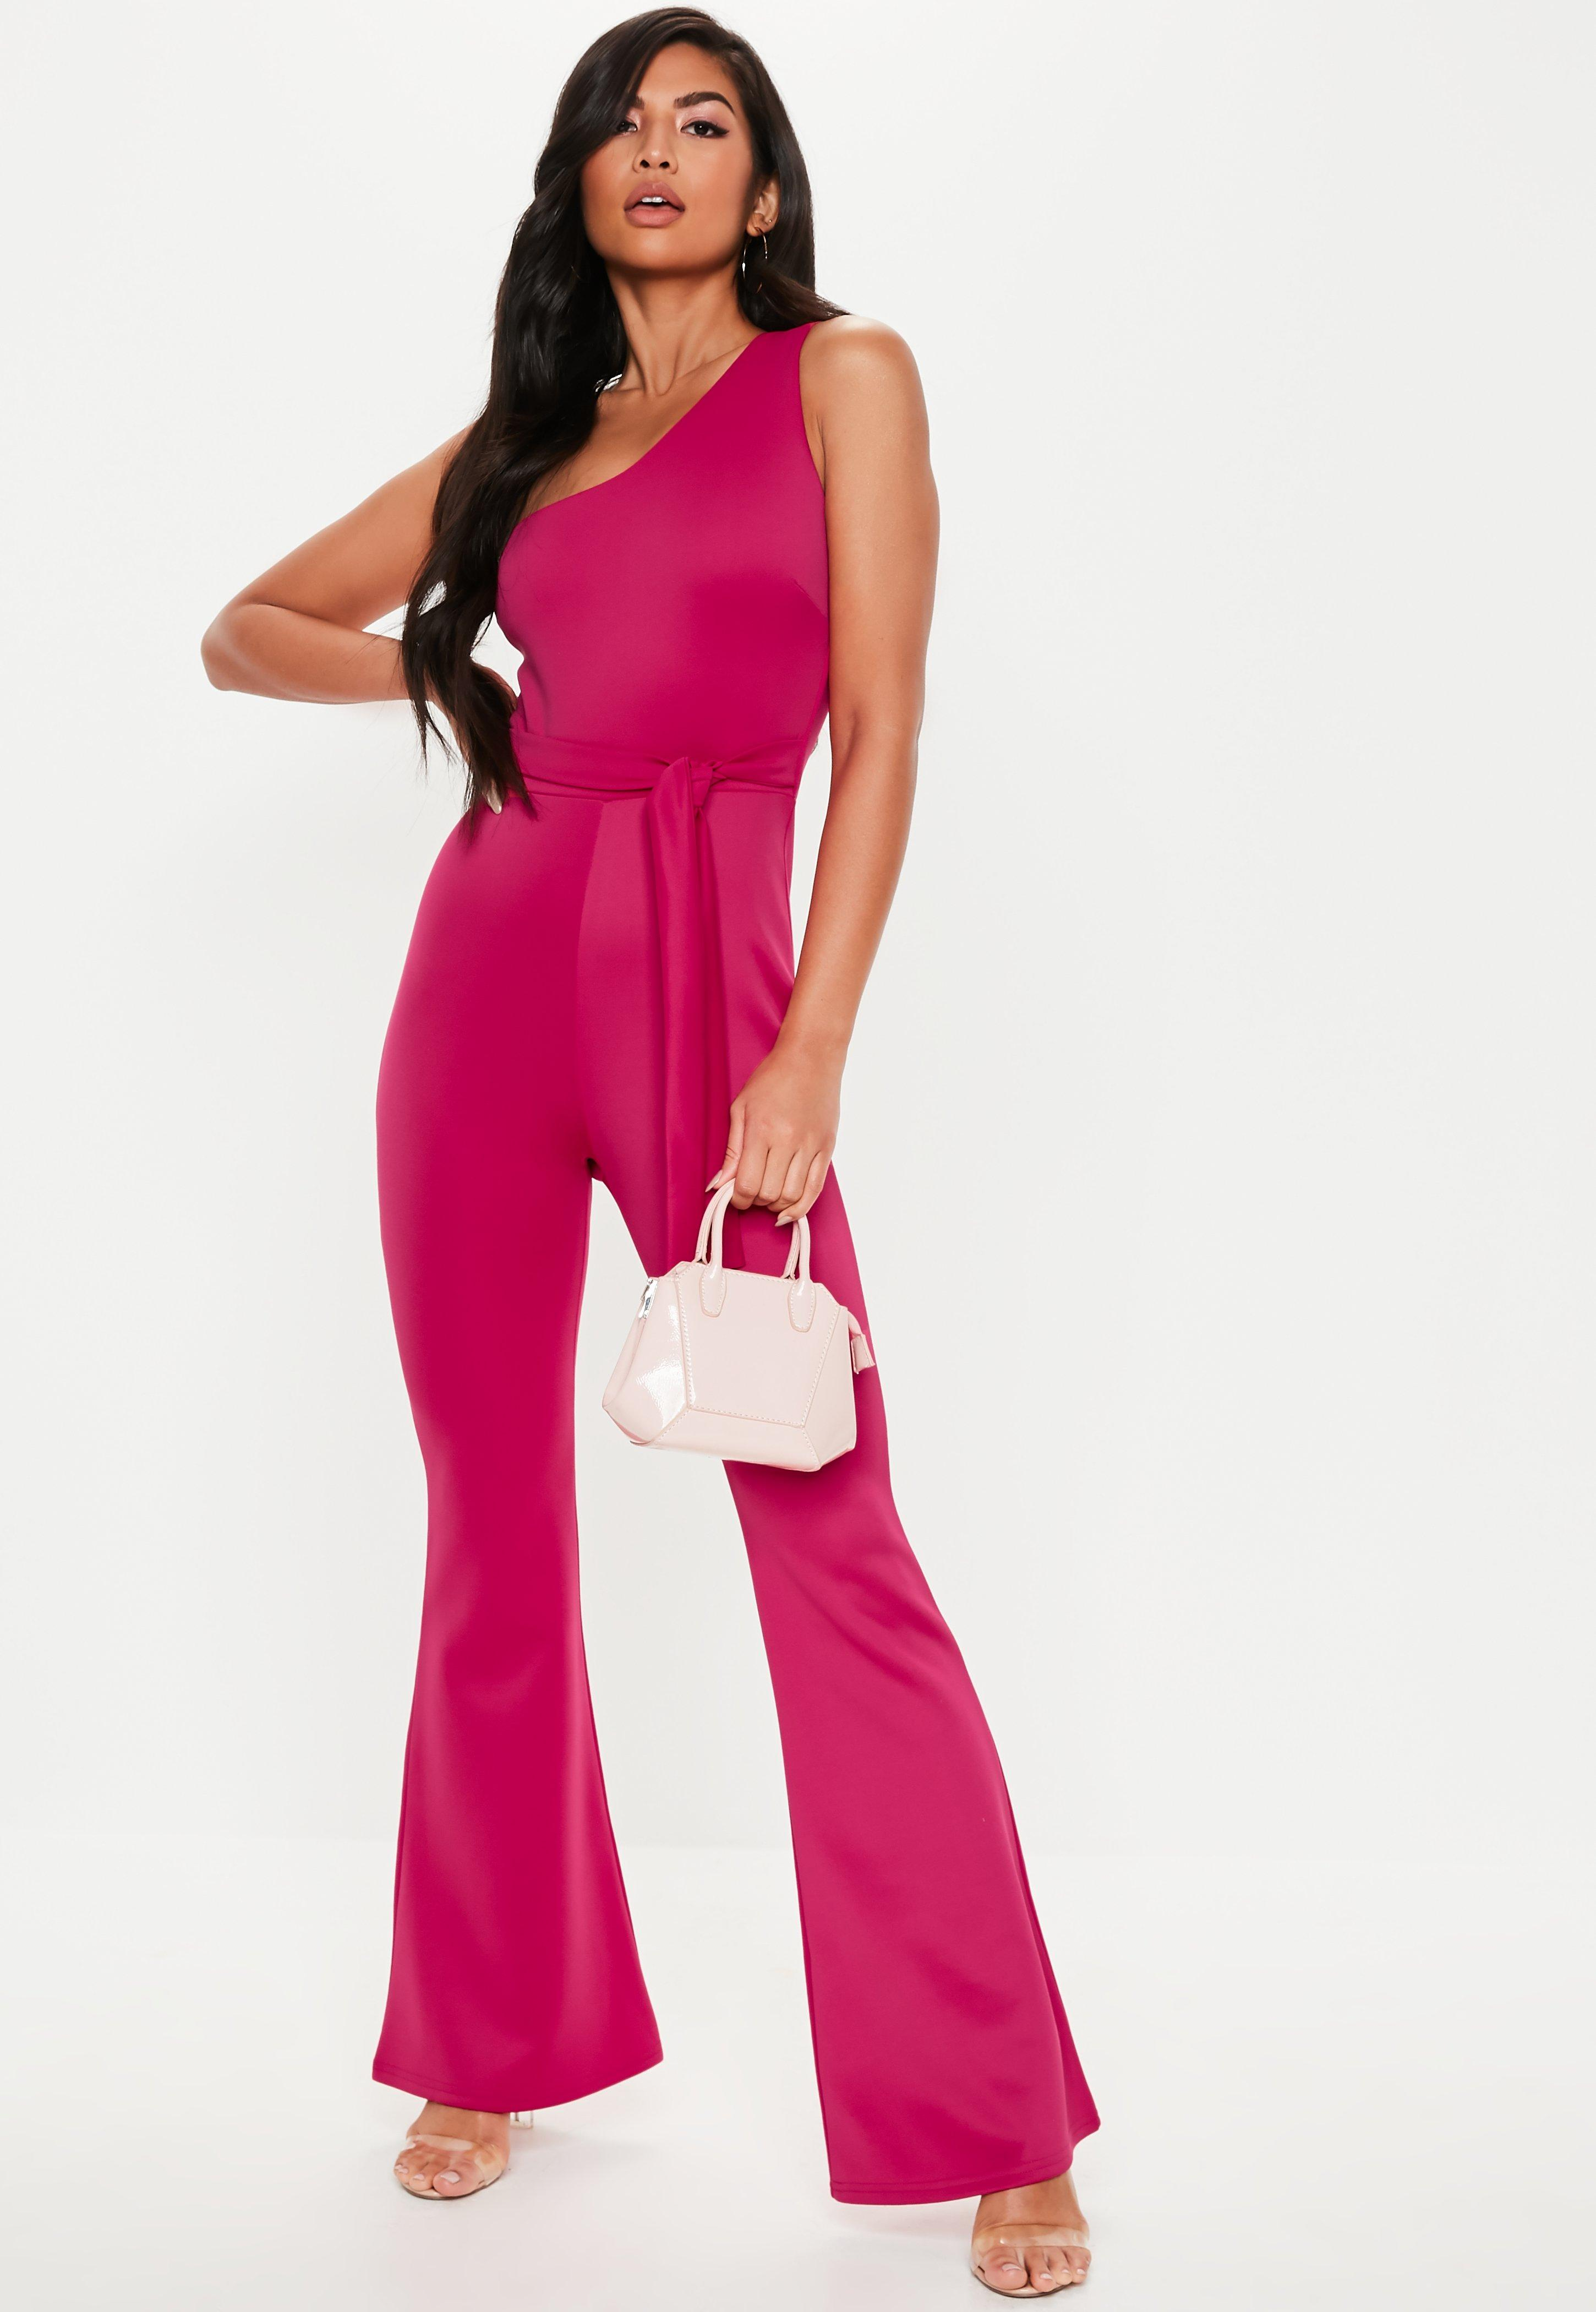 c195bc0055f Dressy Jumpsuits - Evening Jumpsuits